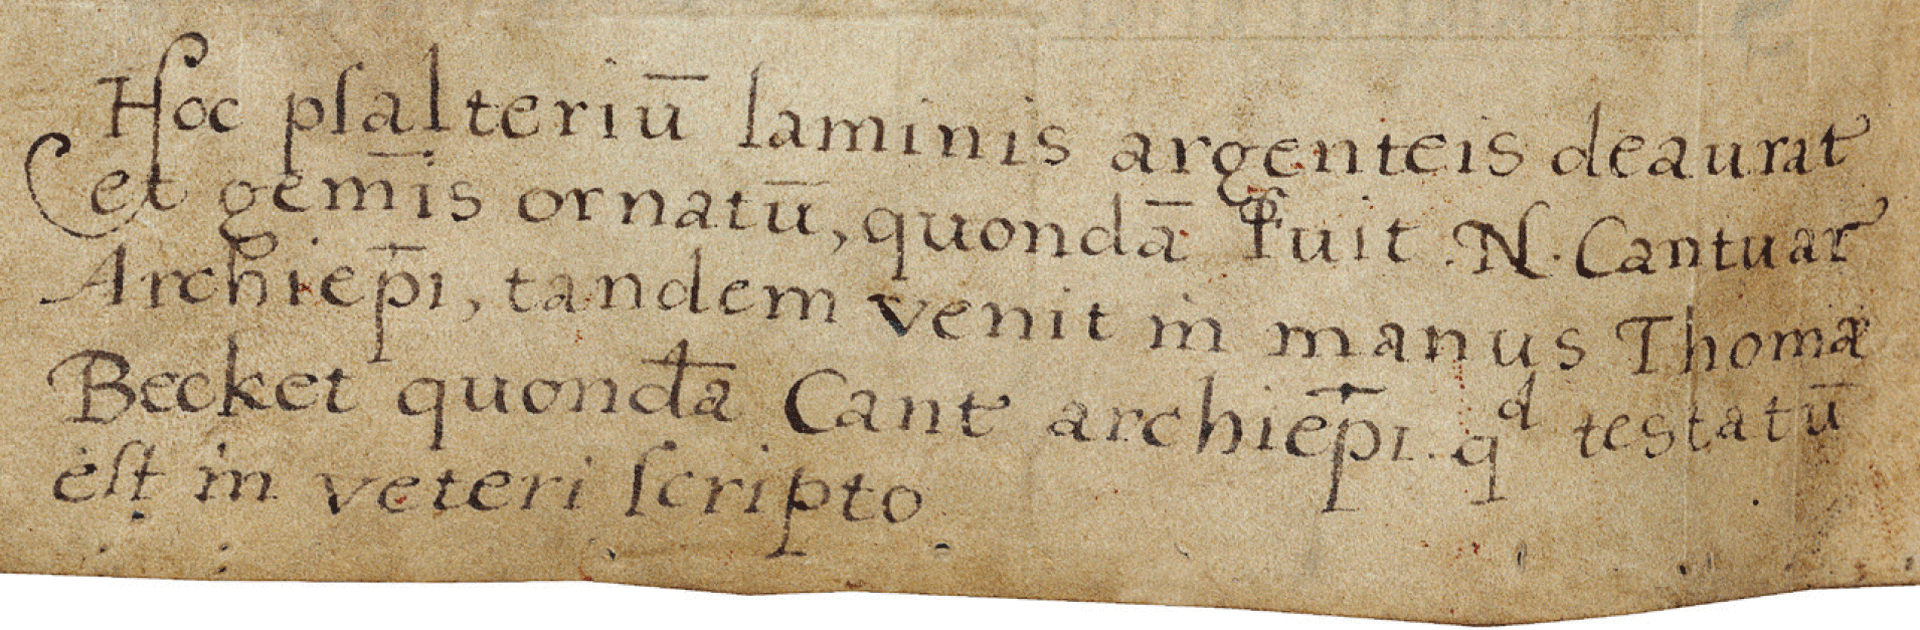 Elizabethan inscription in the Becket psalter